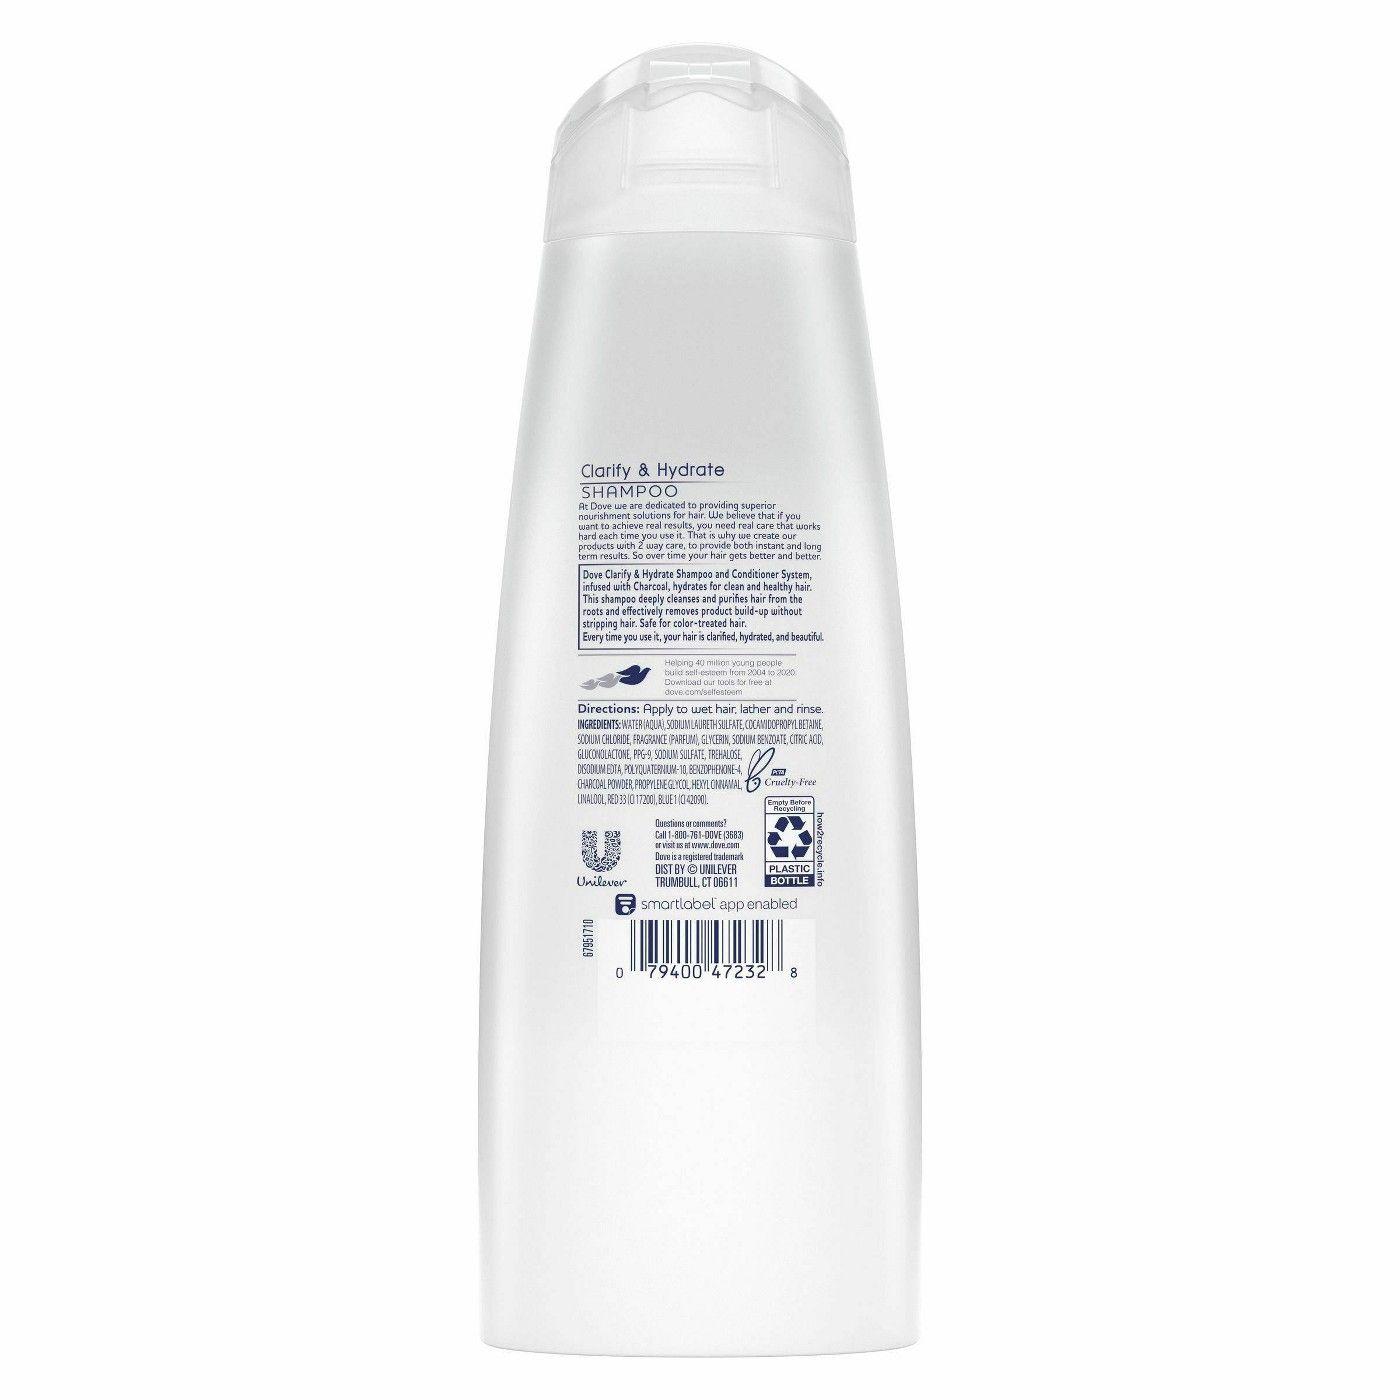 Dove Clarify Charcoal Good Shampoo And Conditioner Paraben Free Conditioner Paraben Free Products